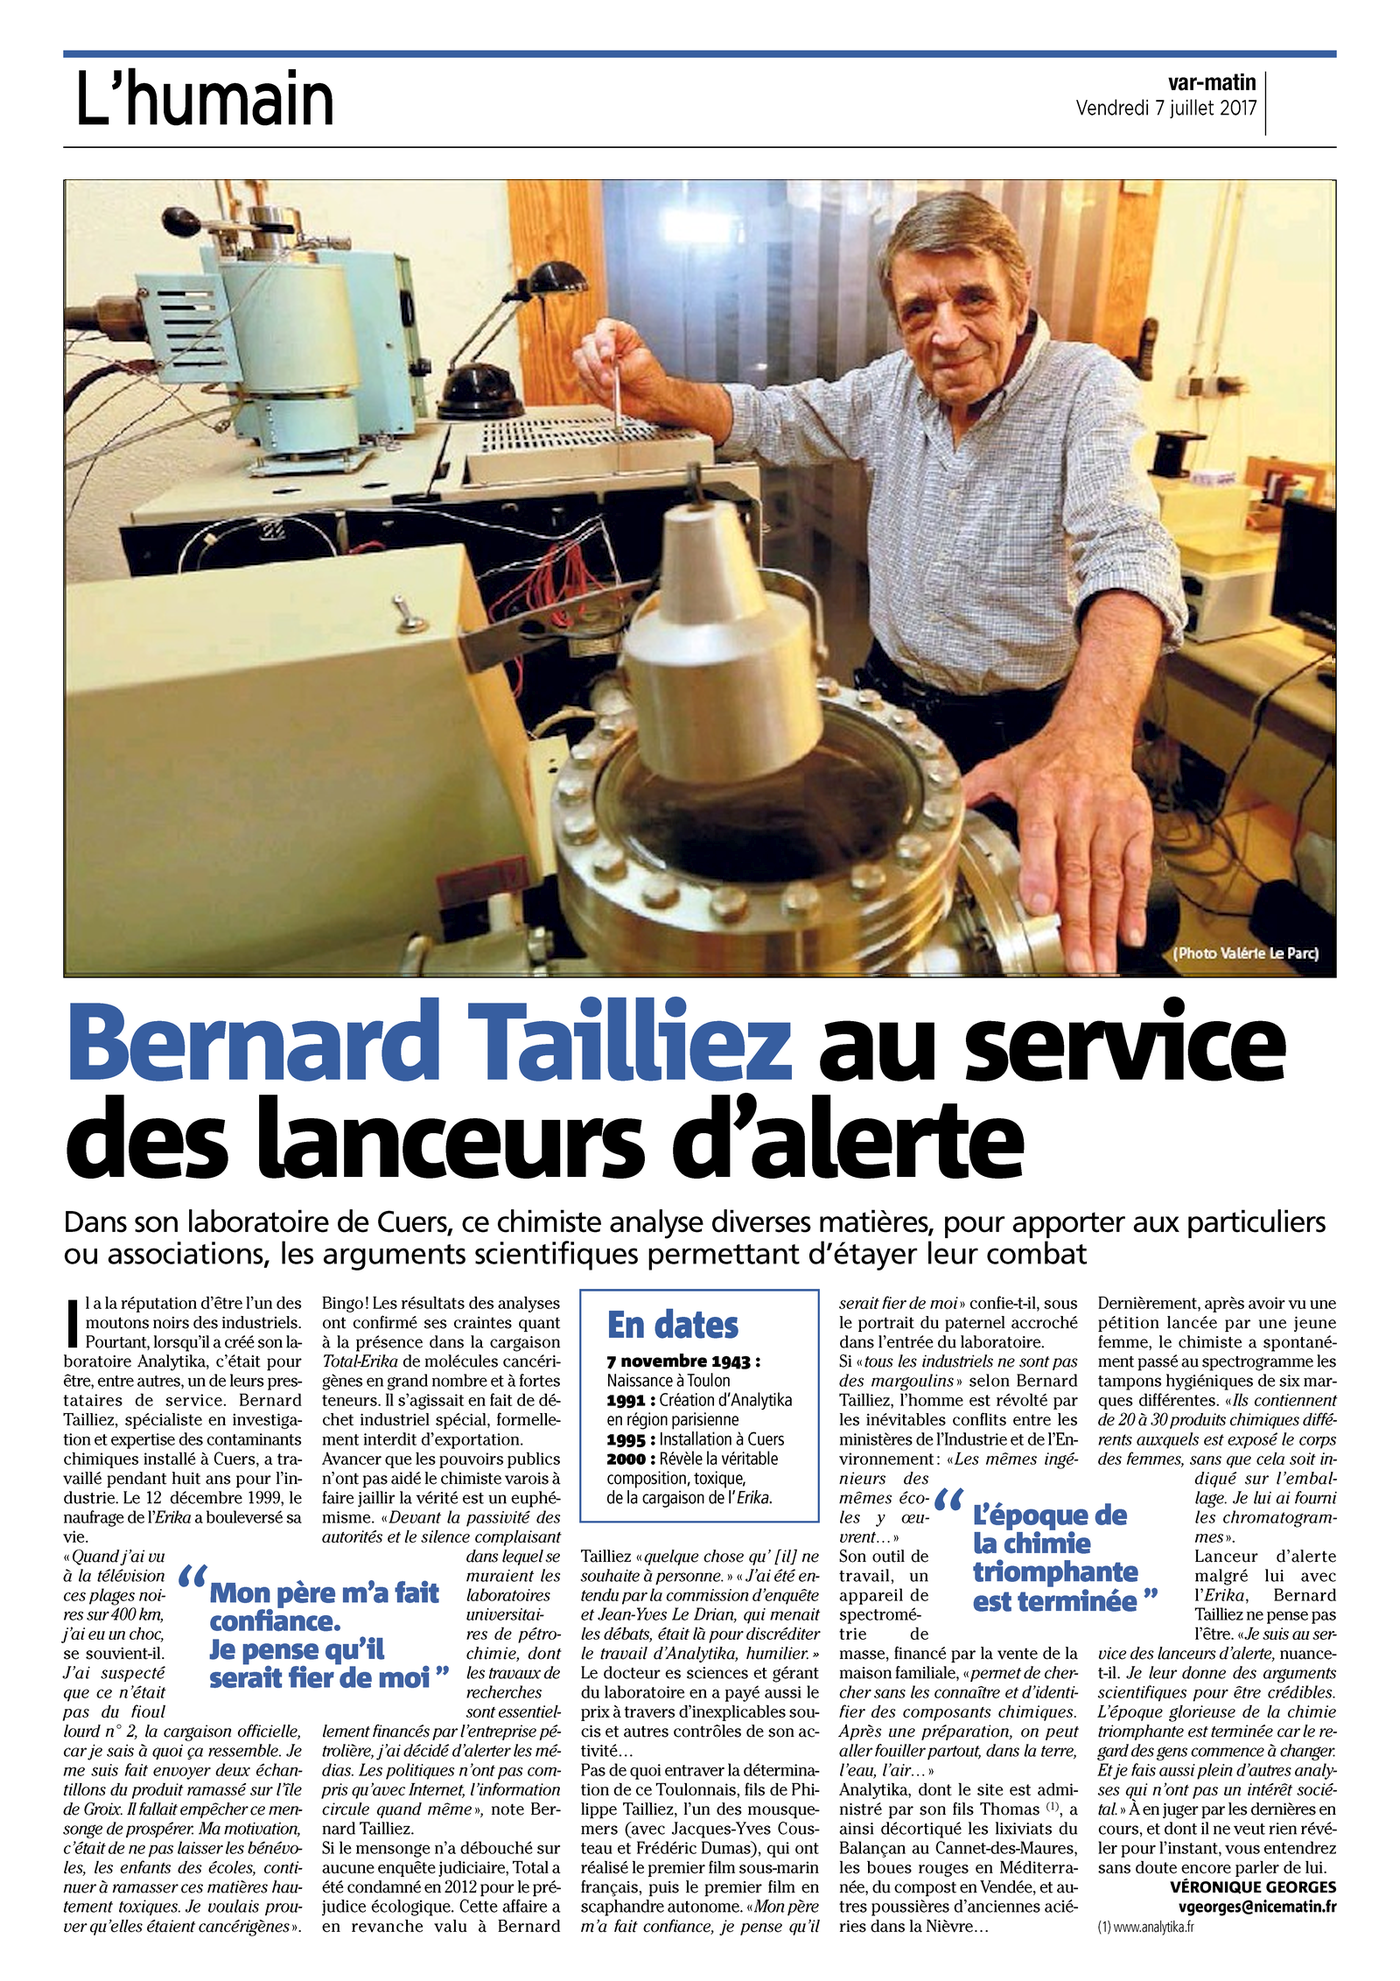 07.07.2017 > VAR-MATIN : L'humain : « Bernard Tailliez au service des lanceurs d'alerte »